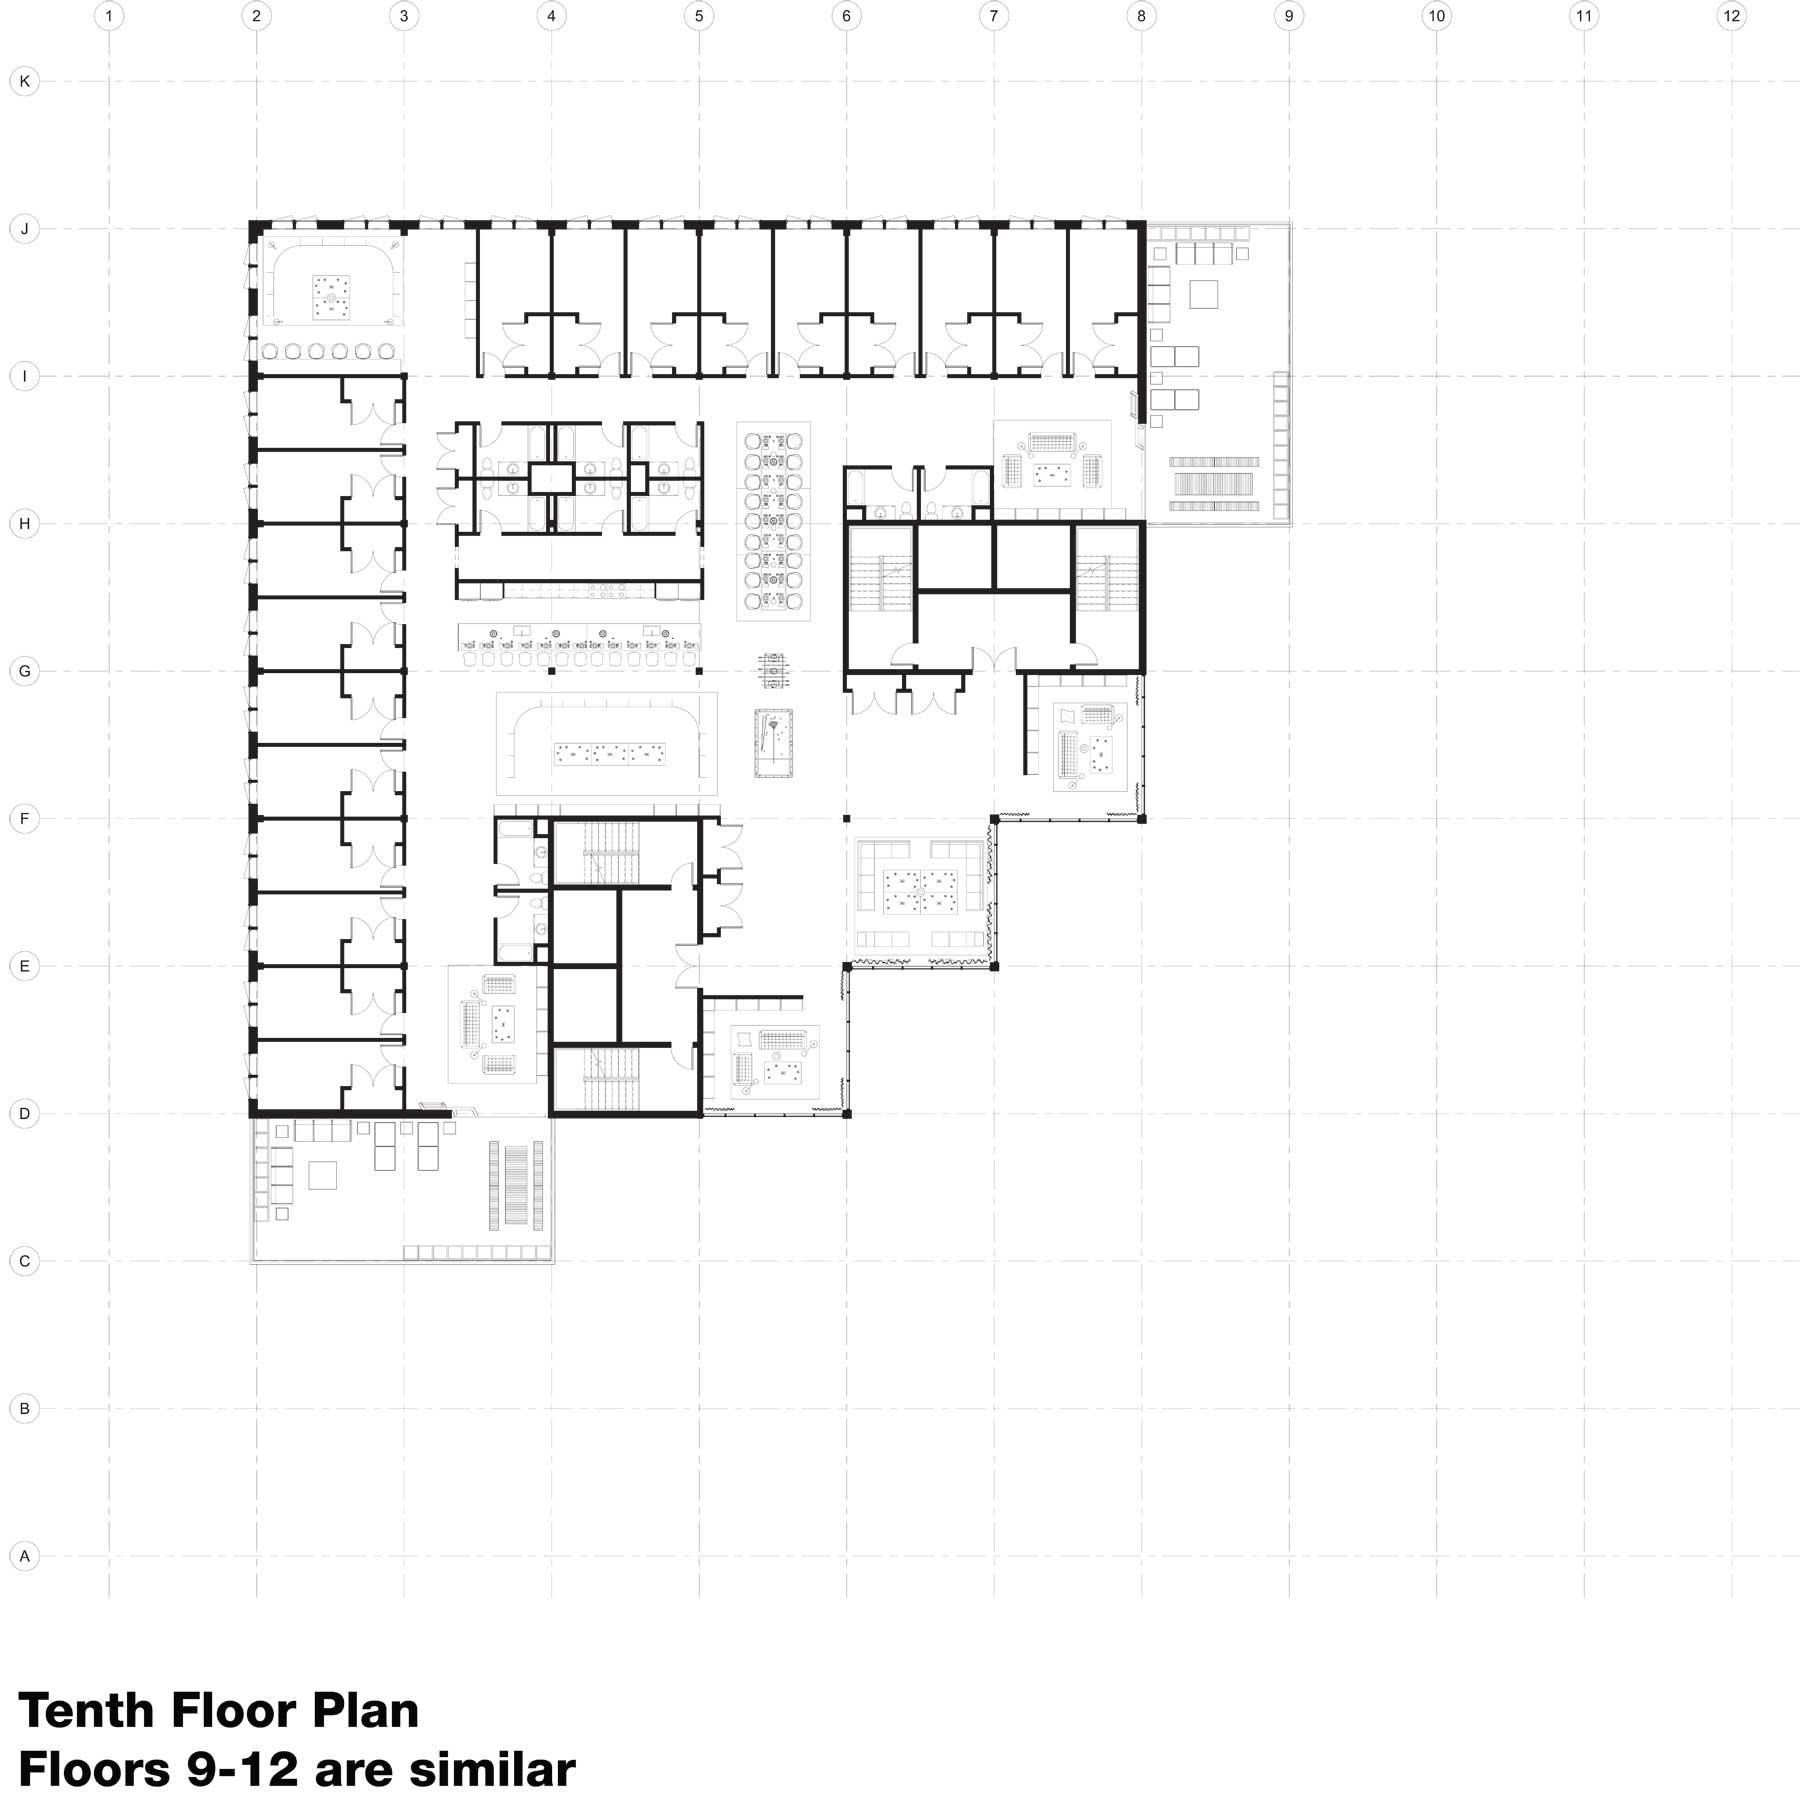 30x30-Intergenerational-Co-Living-10th-Floor-Plan.jpg